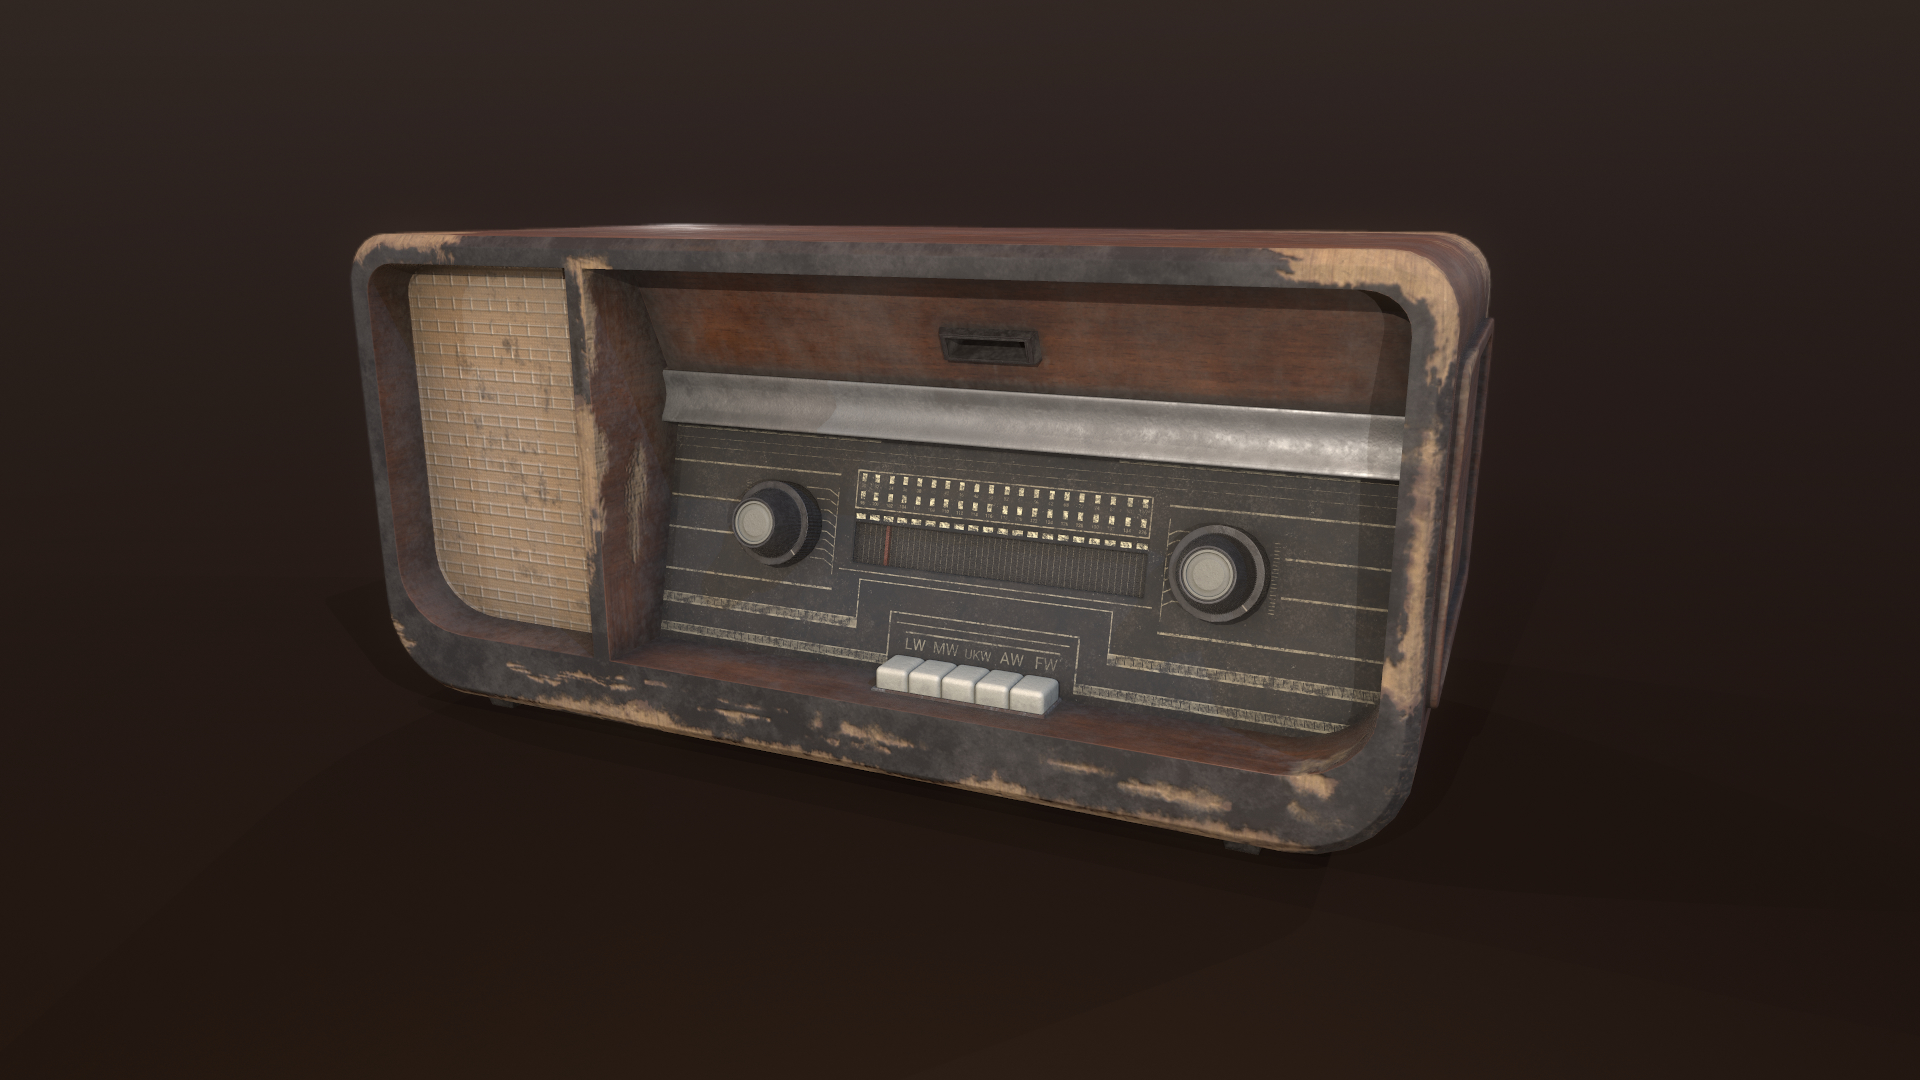 old analog radioreceiver model